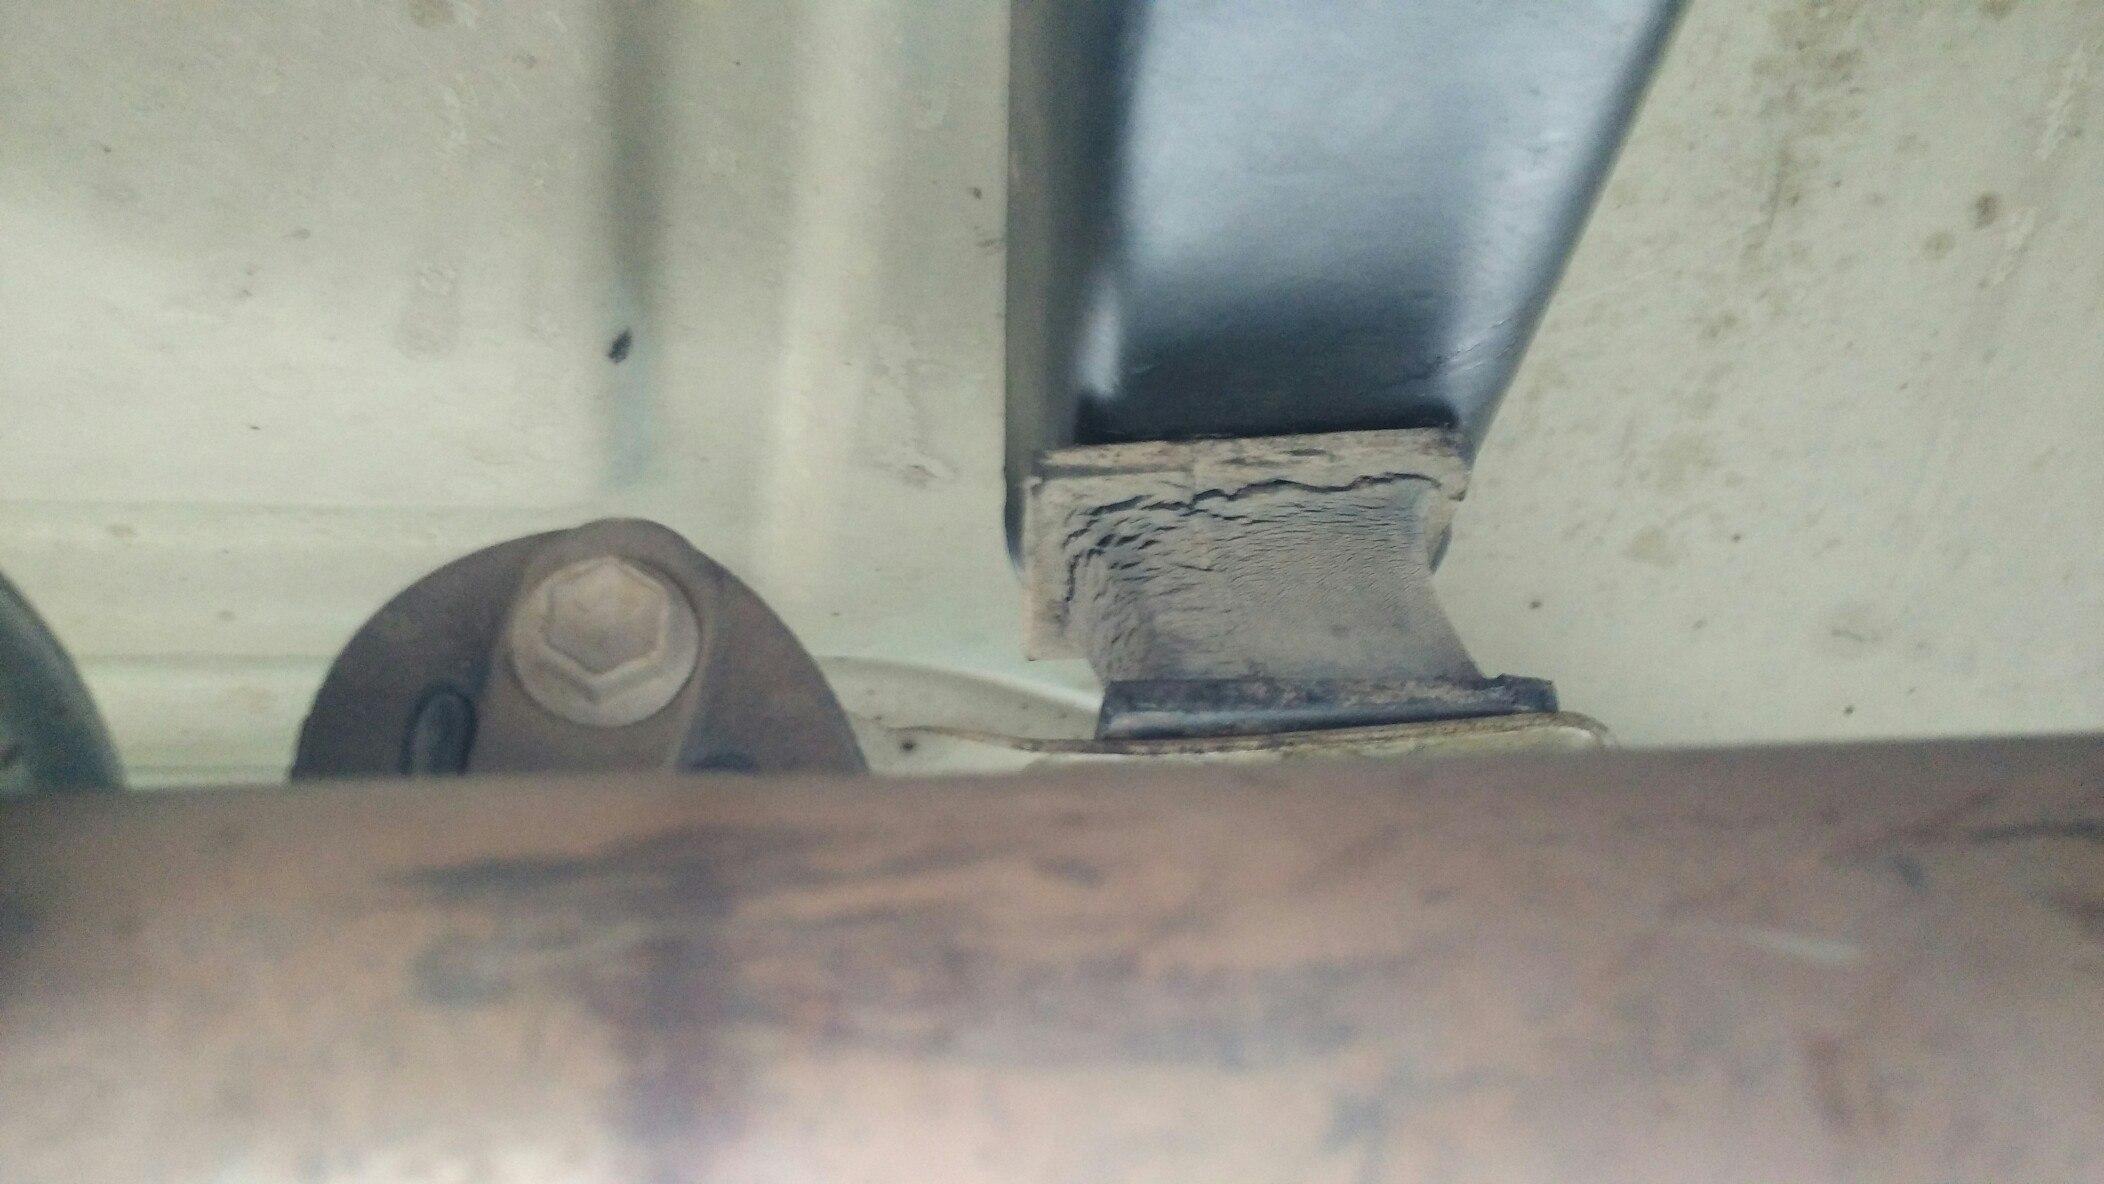 Раздатка отодвинулась на подушках из-за длинного пром кардана ja11